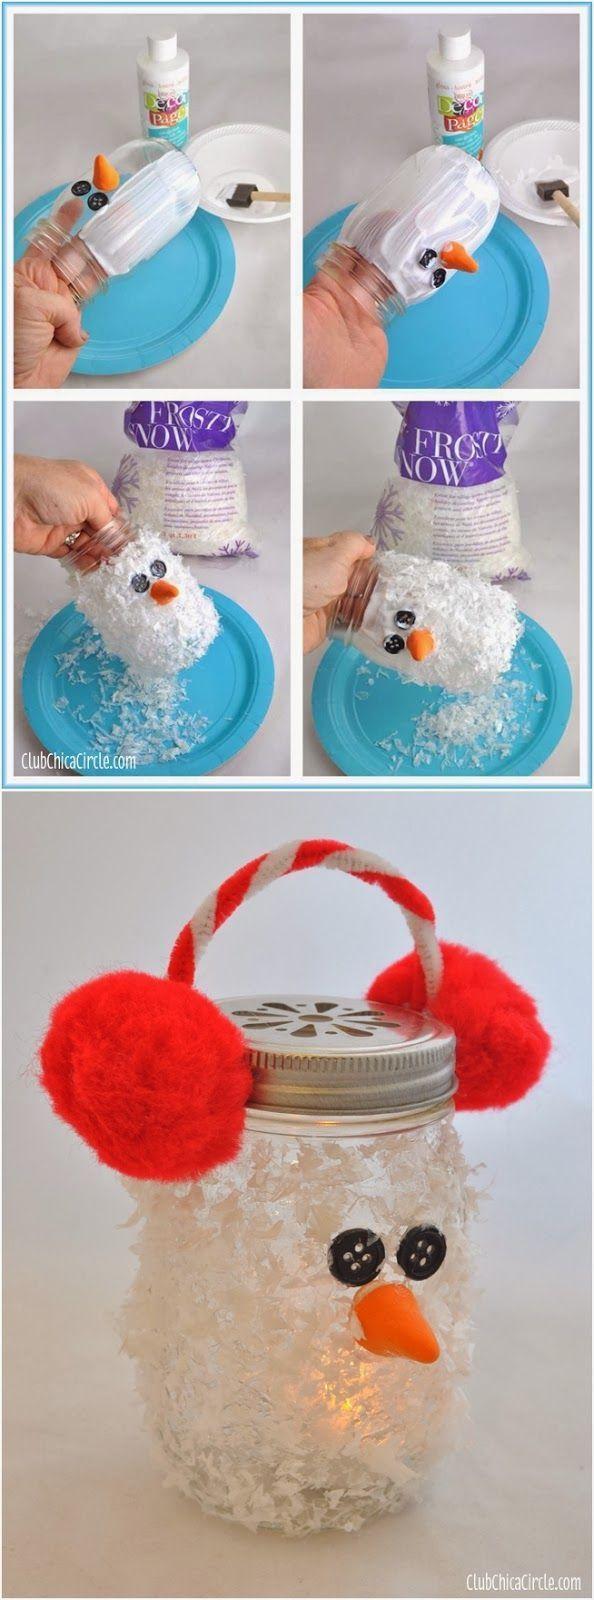 DIY Snowman Jars